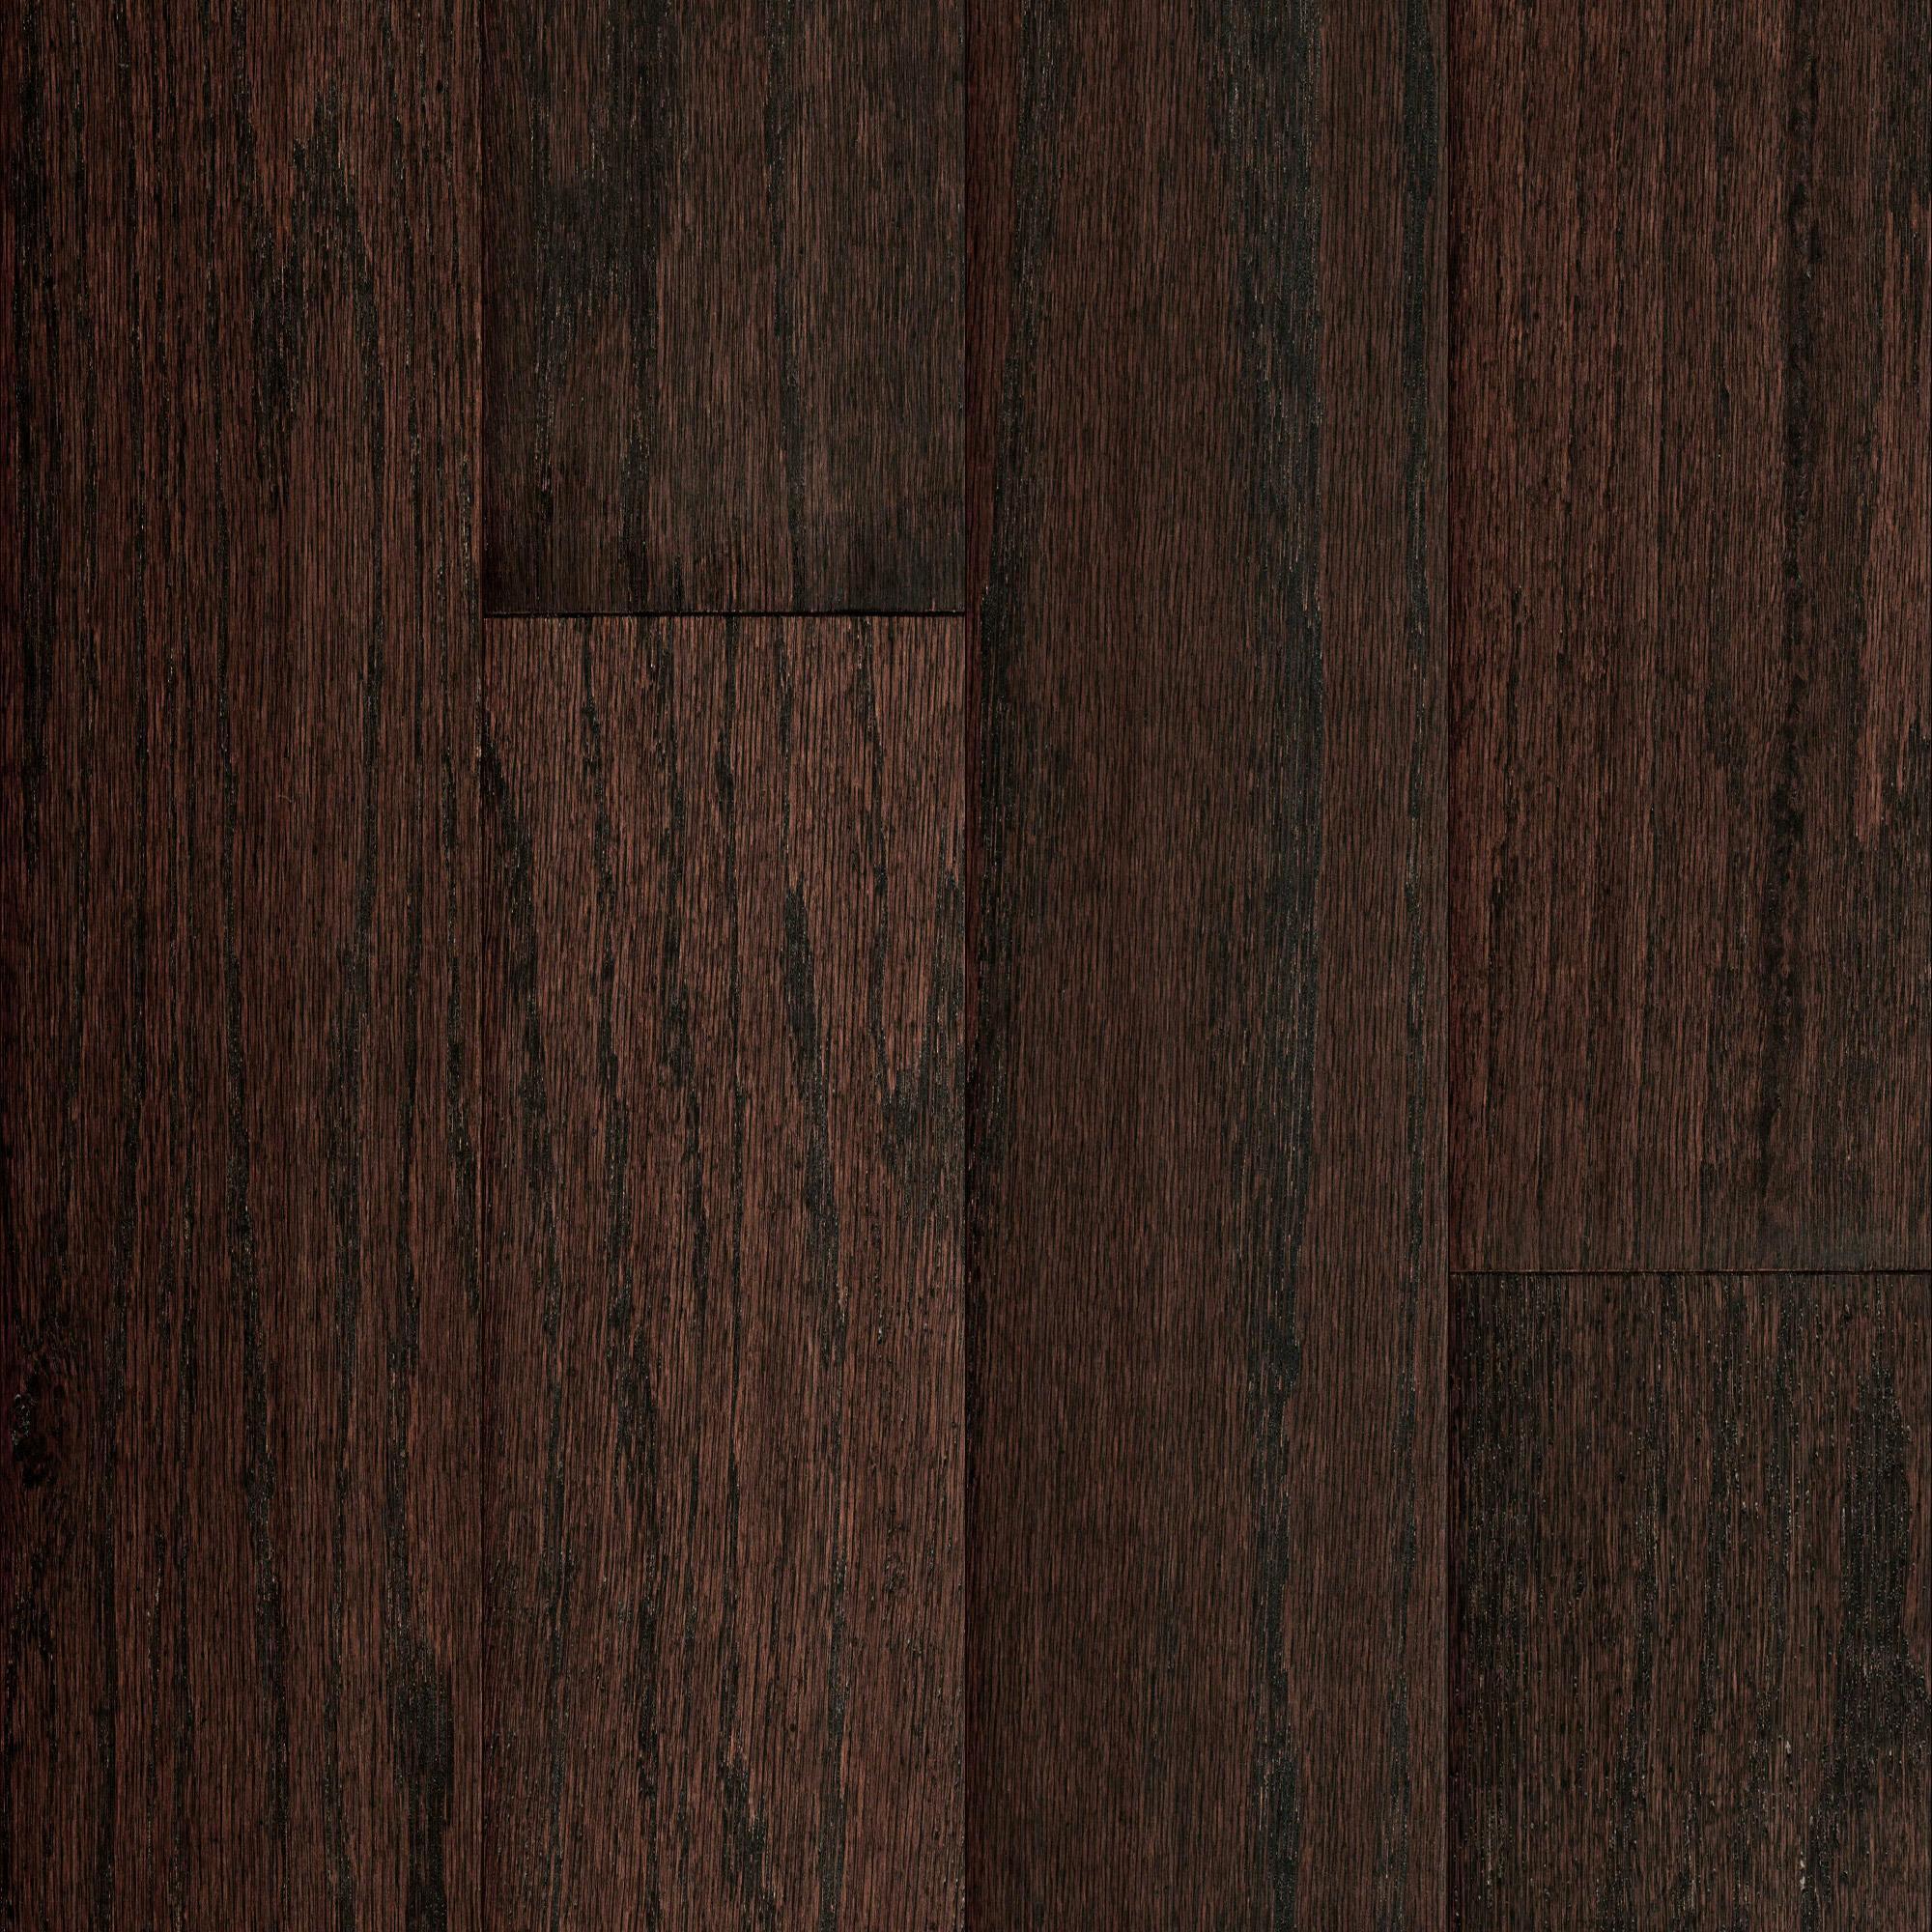 7 engineered hardwood flooring of mullican newtown plank oak bridle 1 2 thick 5 wide engineered throughout mullican newtown plank oak bridle 1 2 thick 5 wide engineered hardwood flooring